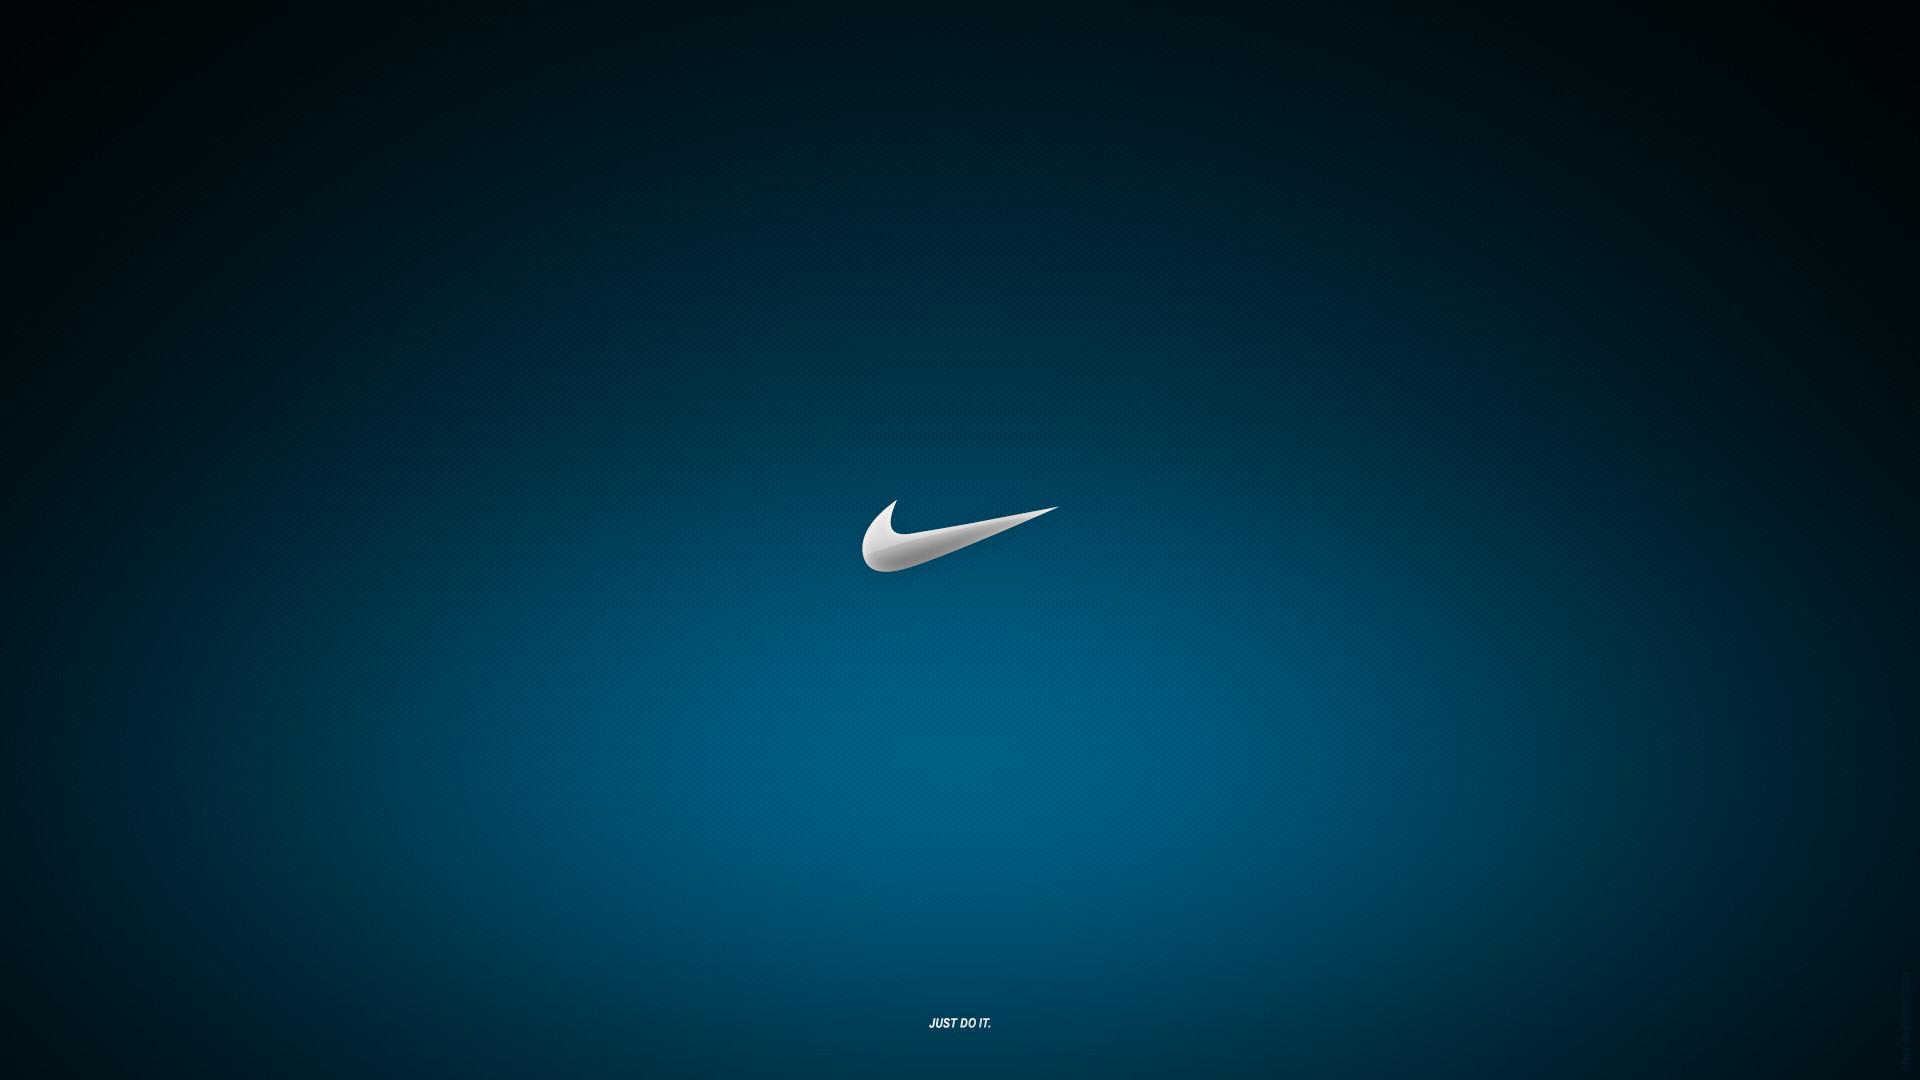 PC Nike Soccer Wallpapers, Urbano Denton